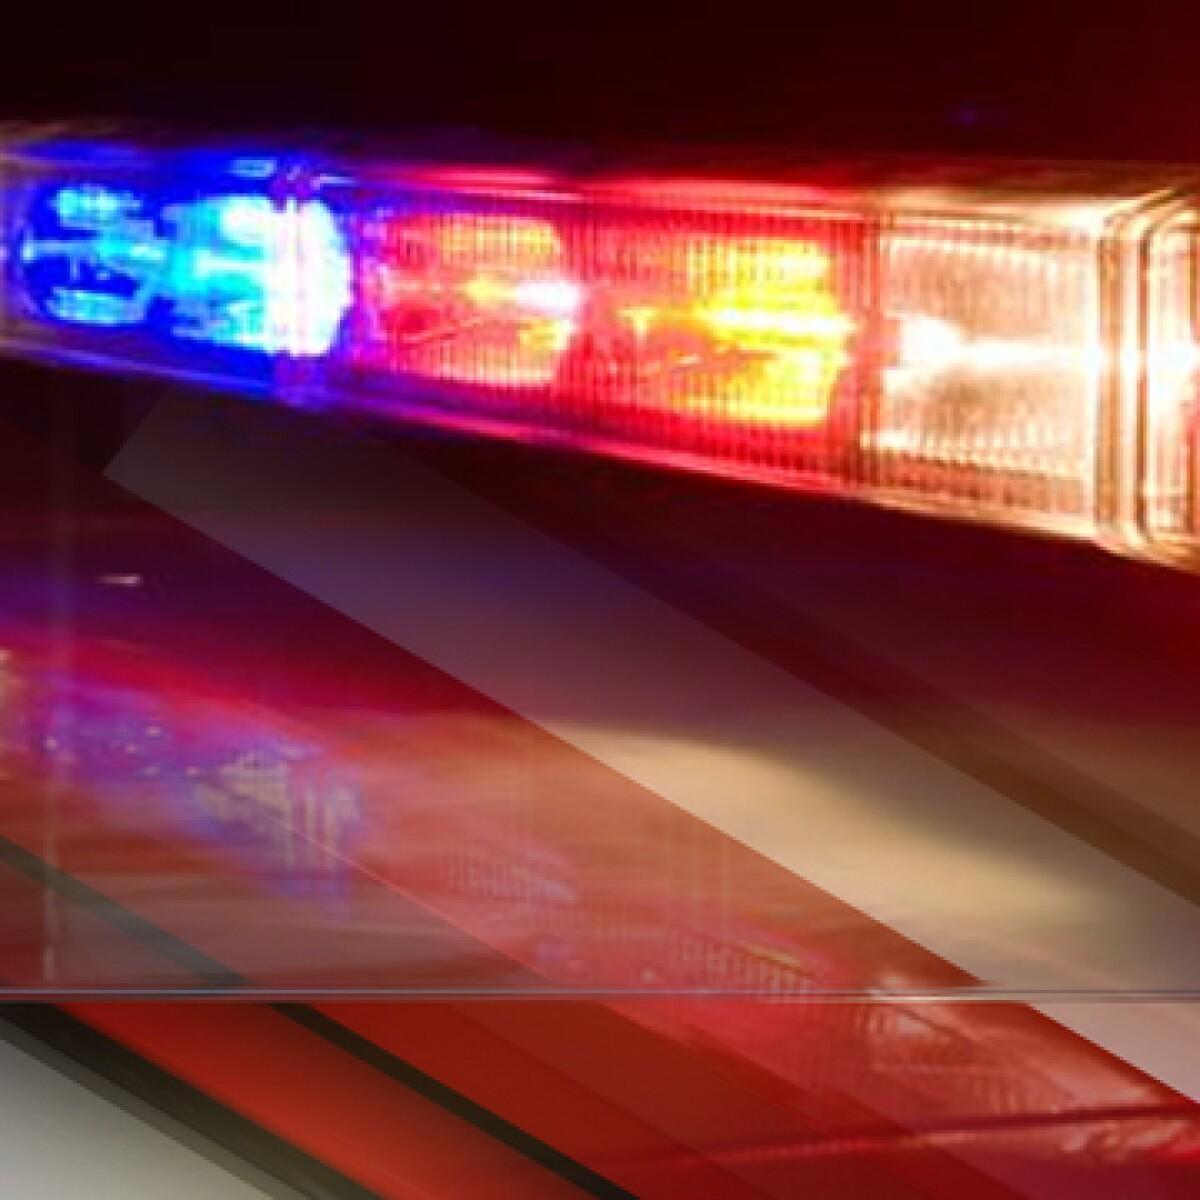 Denver Man Dies After Car Struck Building In Nebraska